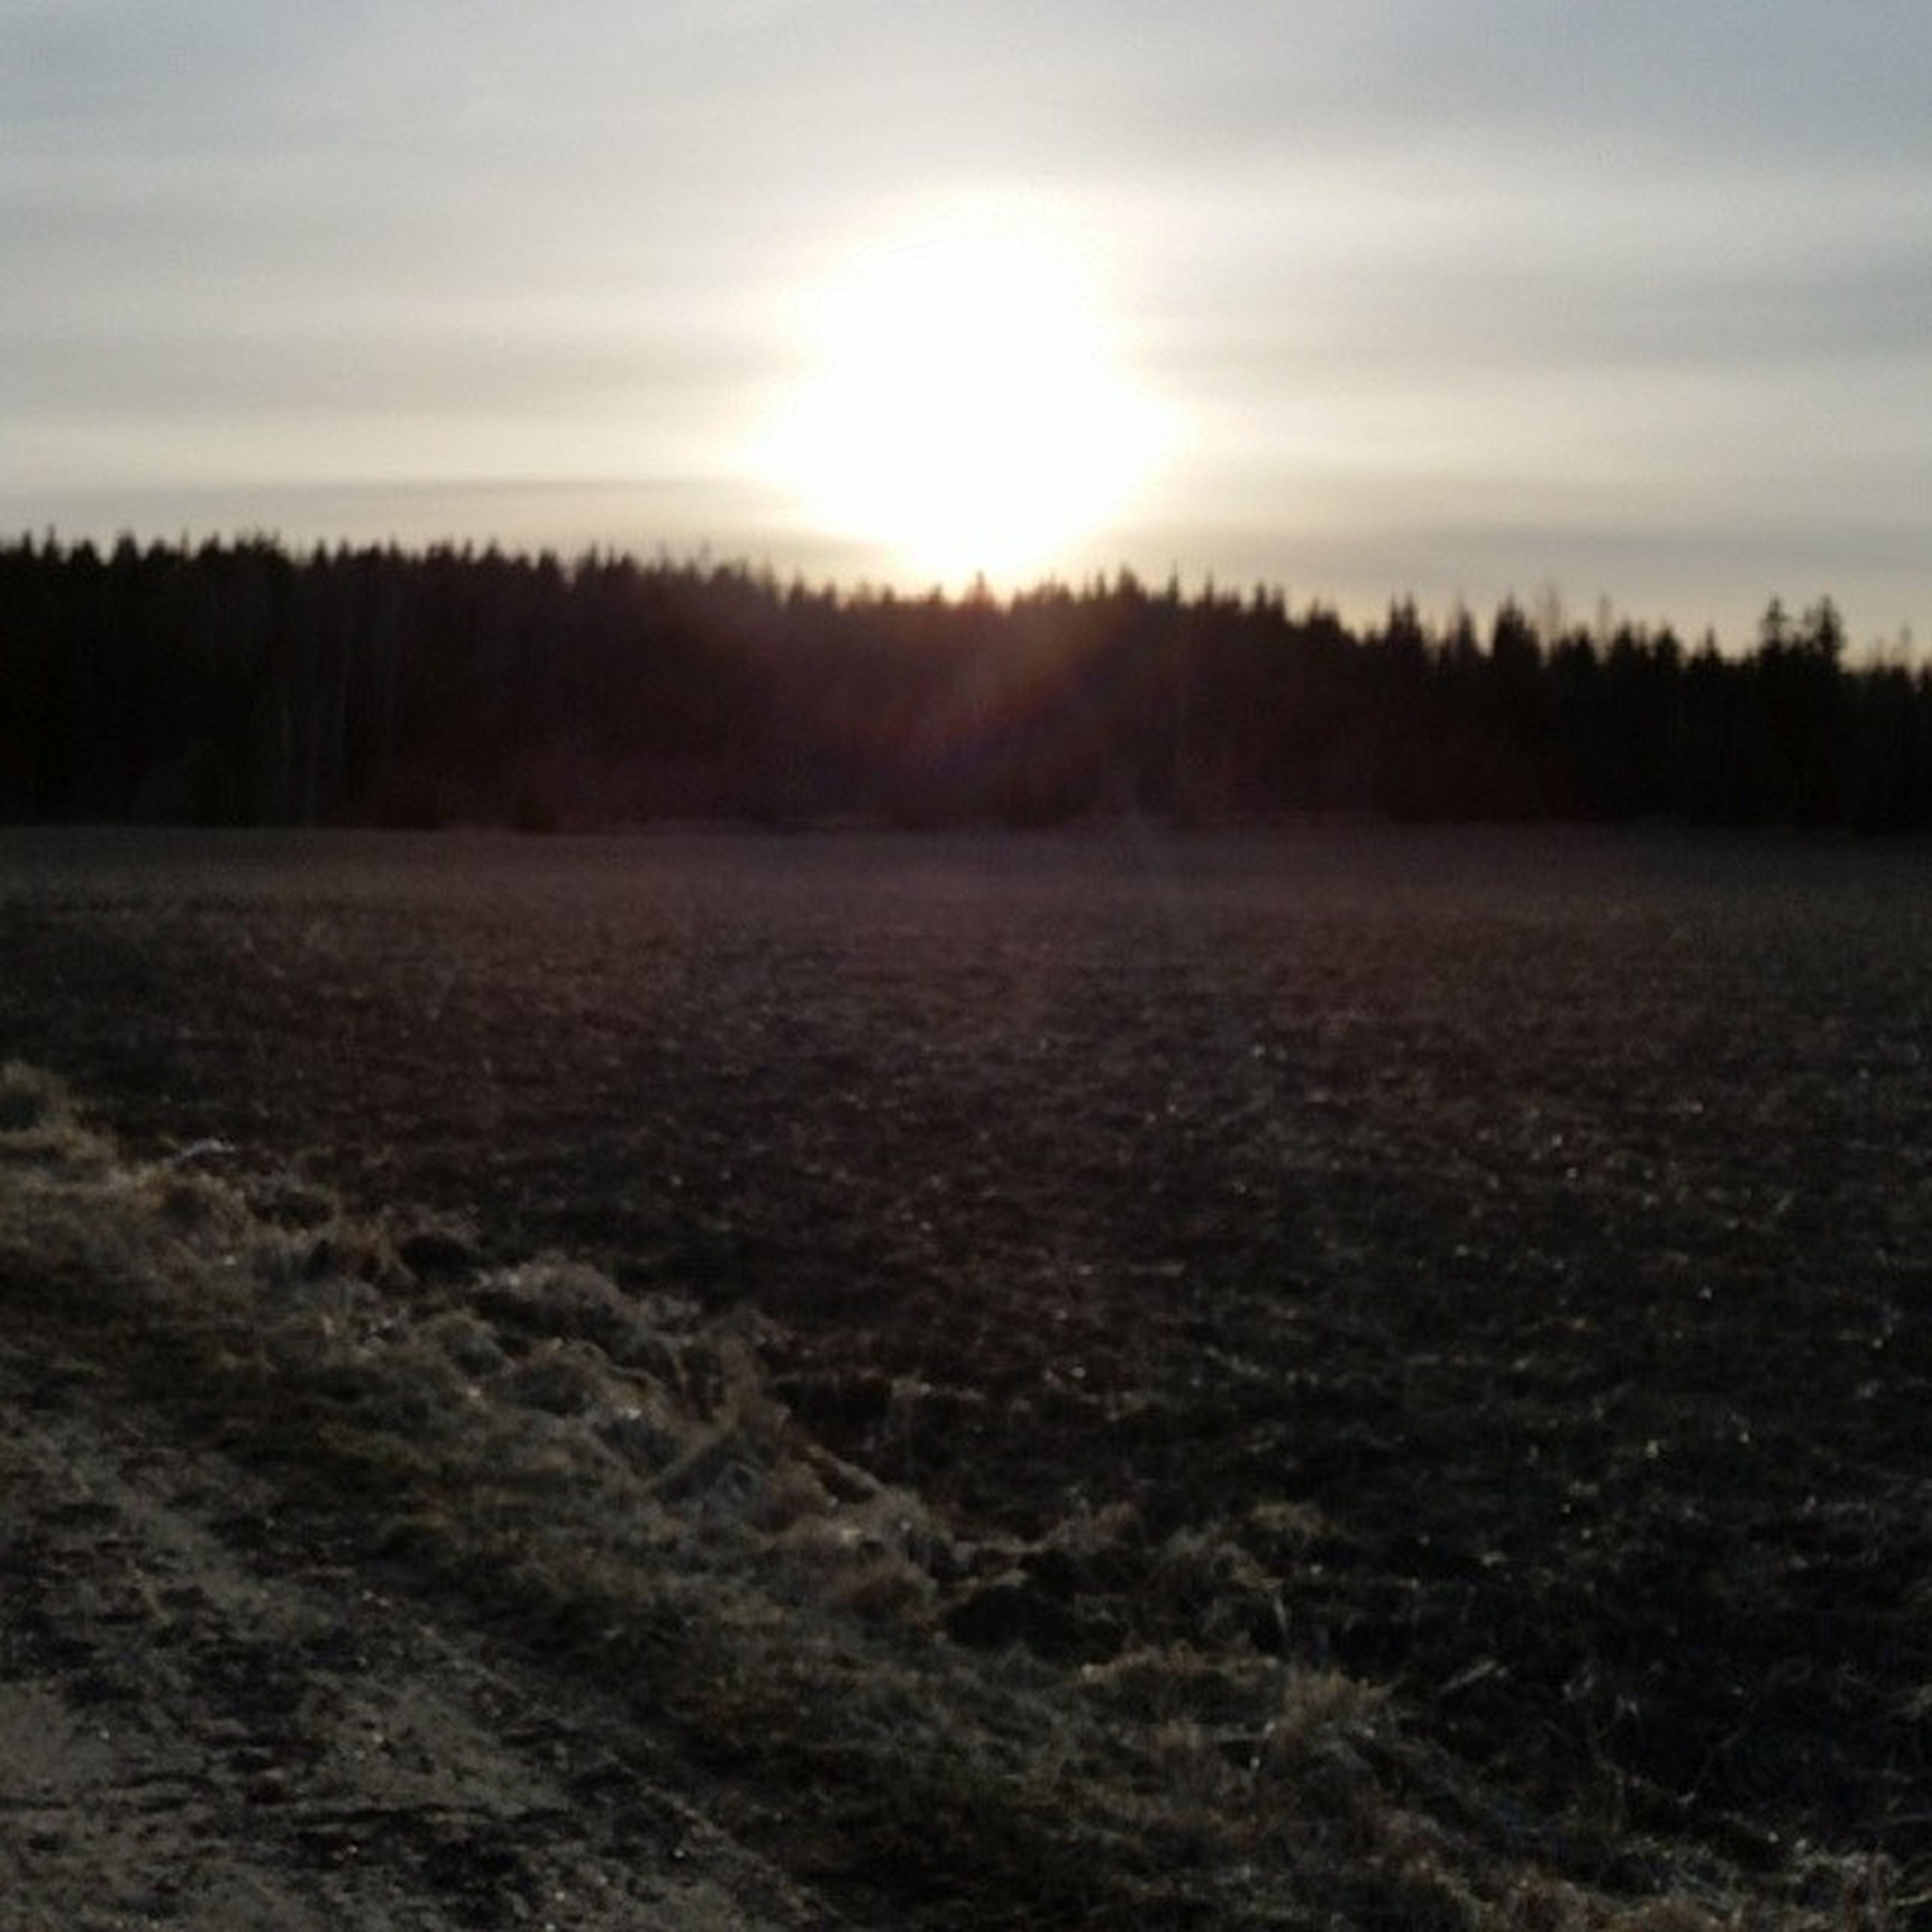 tranquil scene, tranquility, tree, landscape, scenics, sunset, sun, nature, beauty in nature, sky, field, sunlight, winter, snow, non-urban scene, bare tree, cold temperature, forest, sunbeam, outdoors